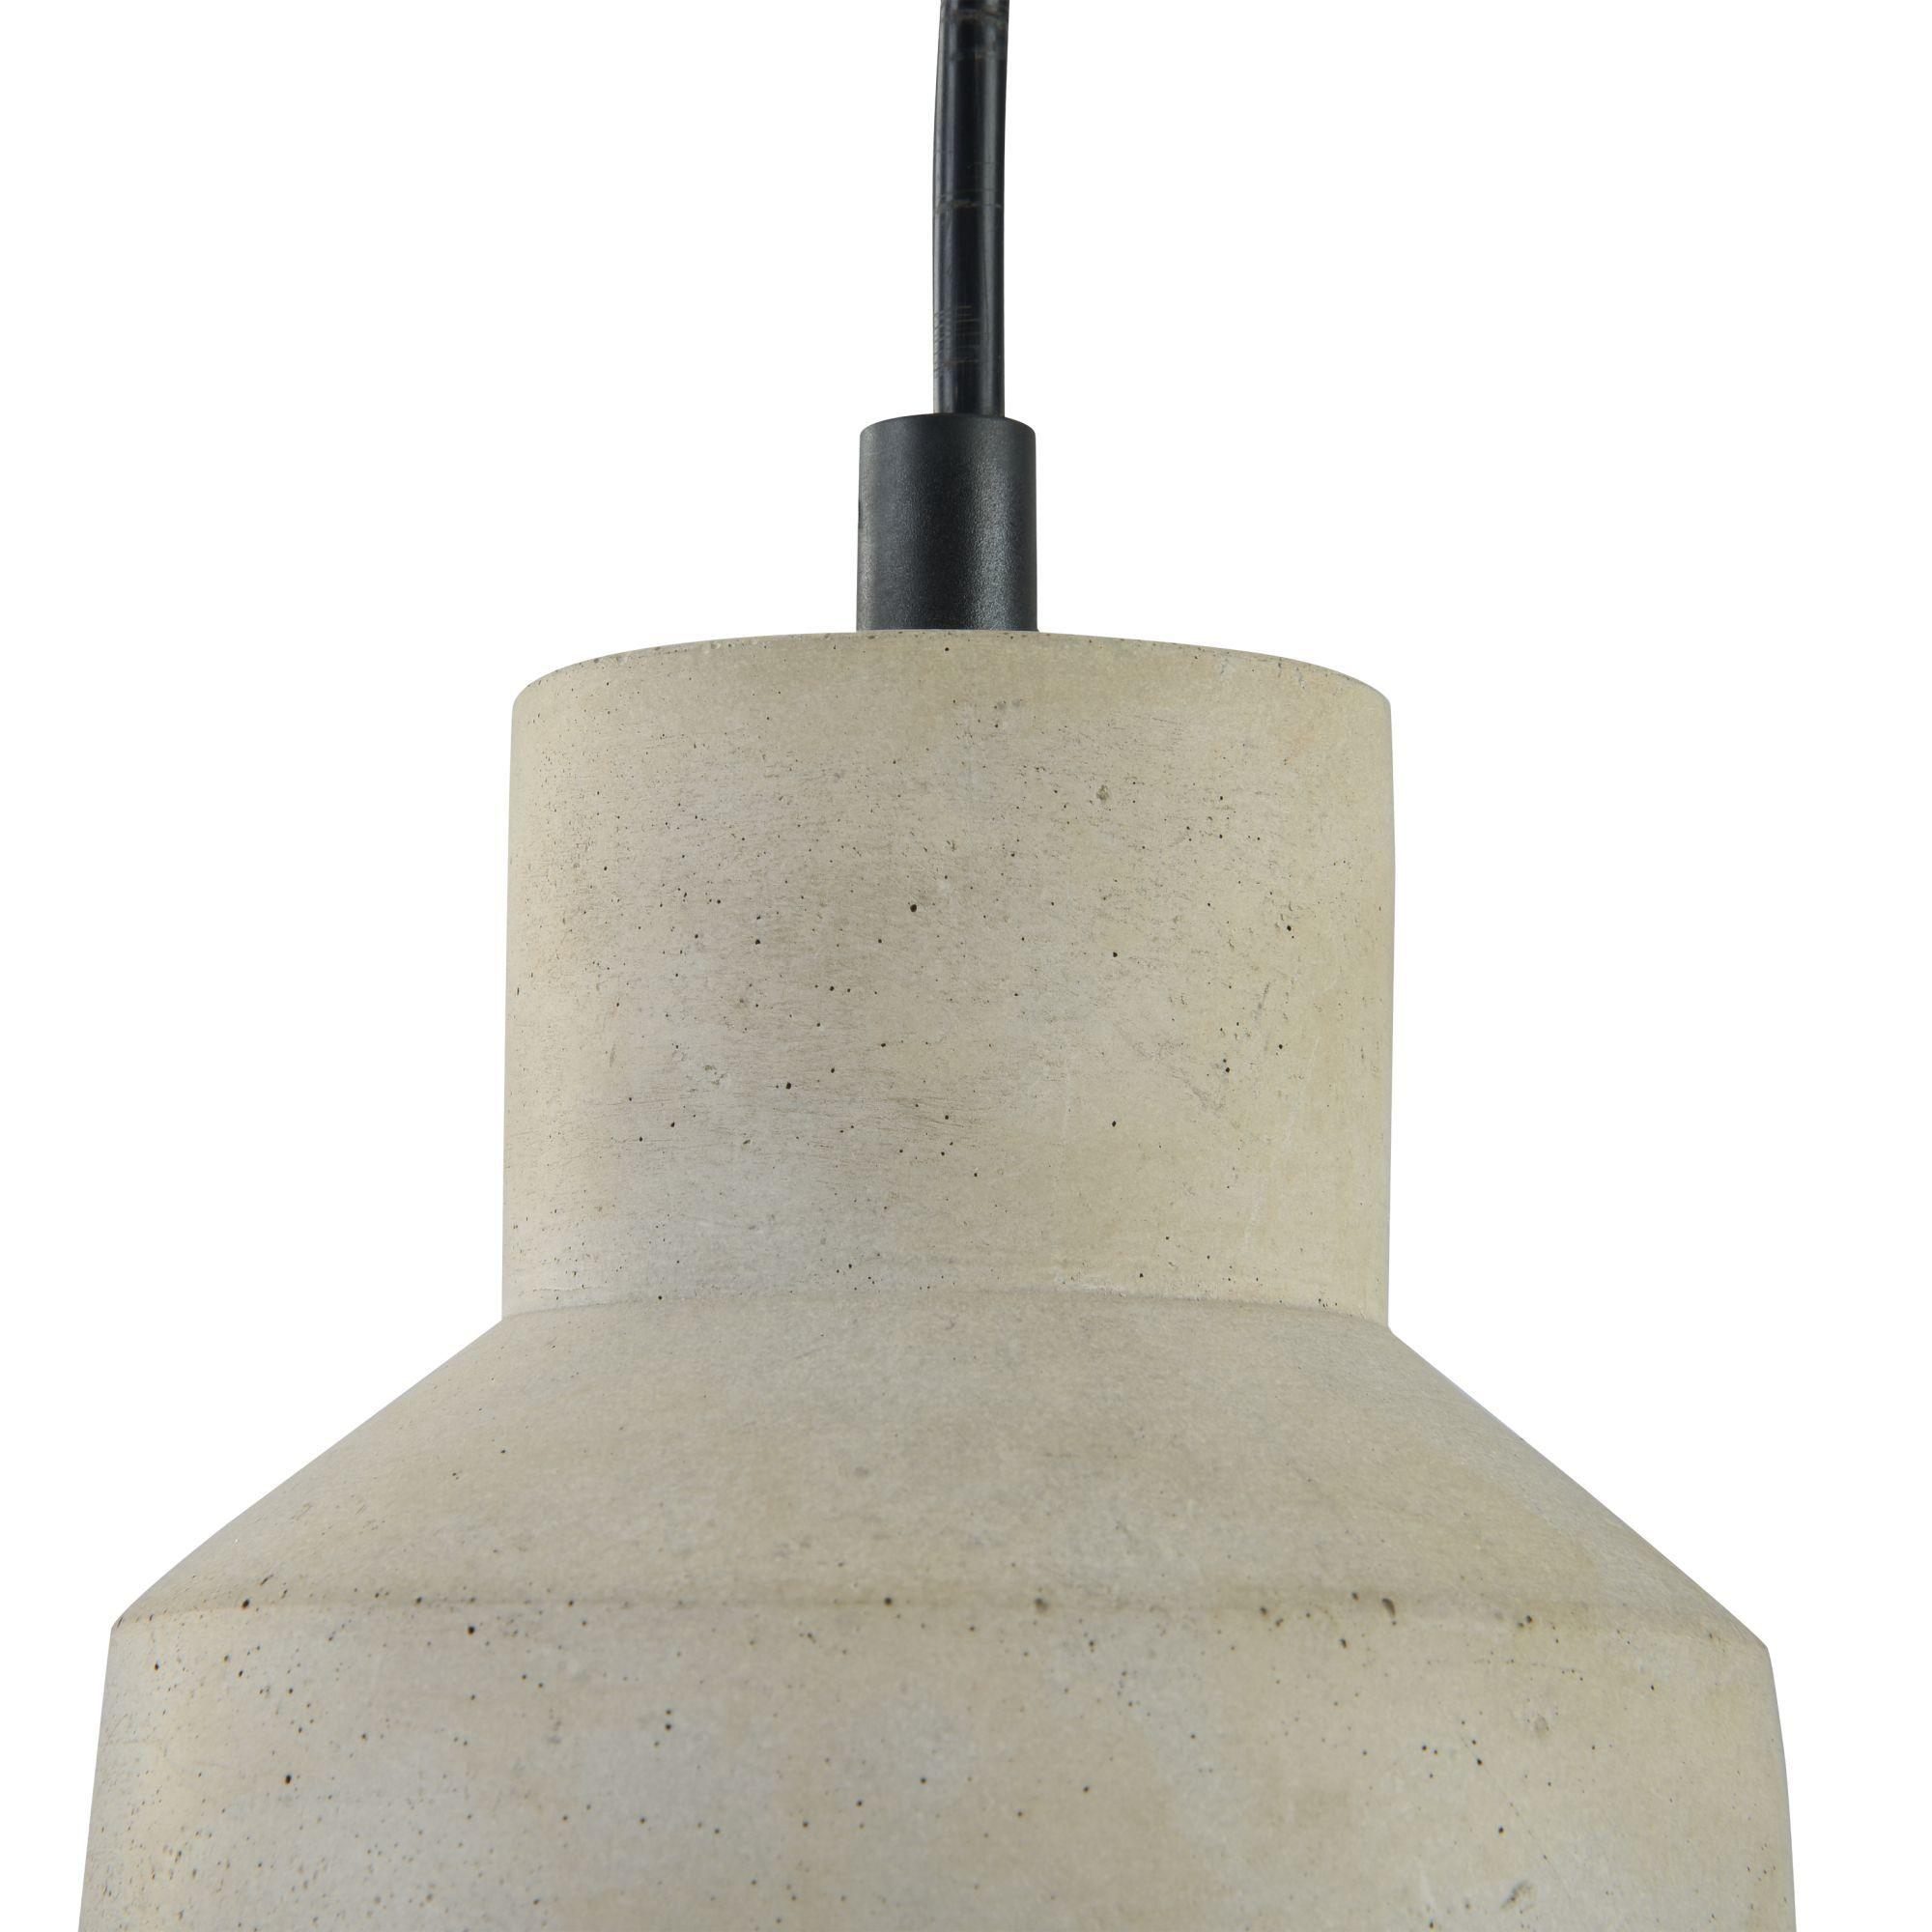 Подвесной светильник Maytoni Broni T437-PL-01-GR, 1xE27x60W, черный, серый, металл, бетон - фото 10